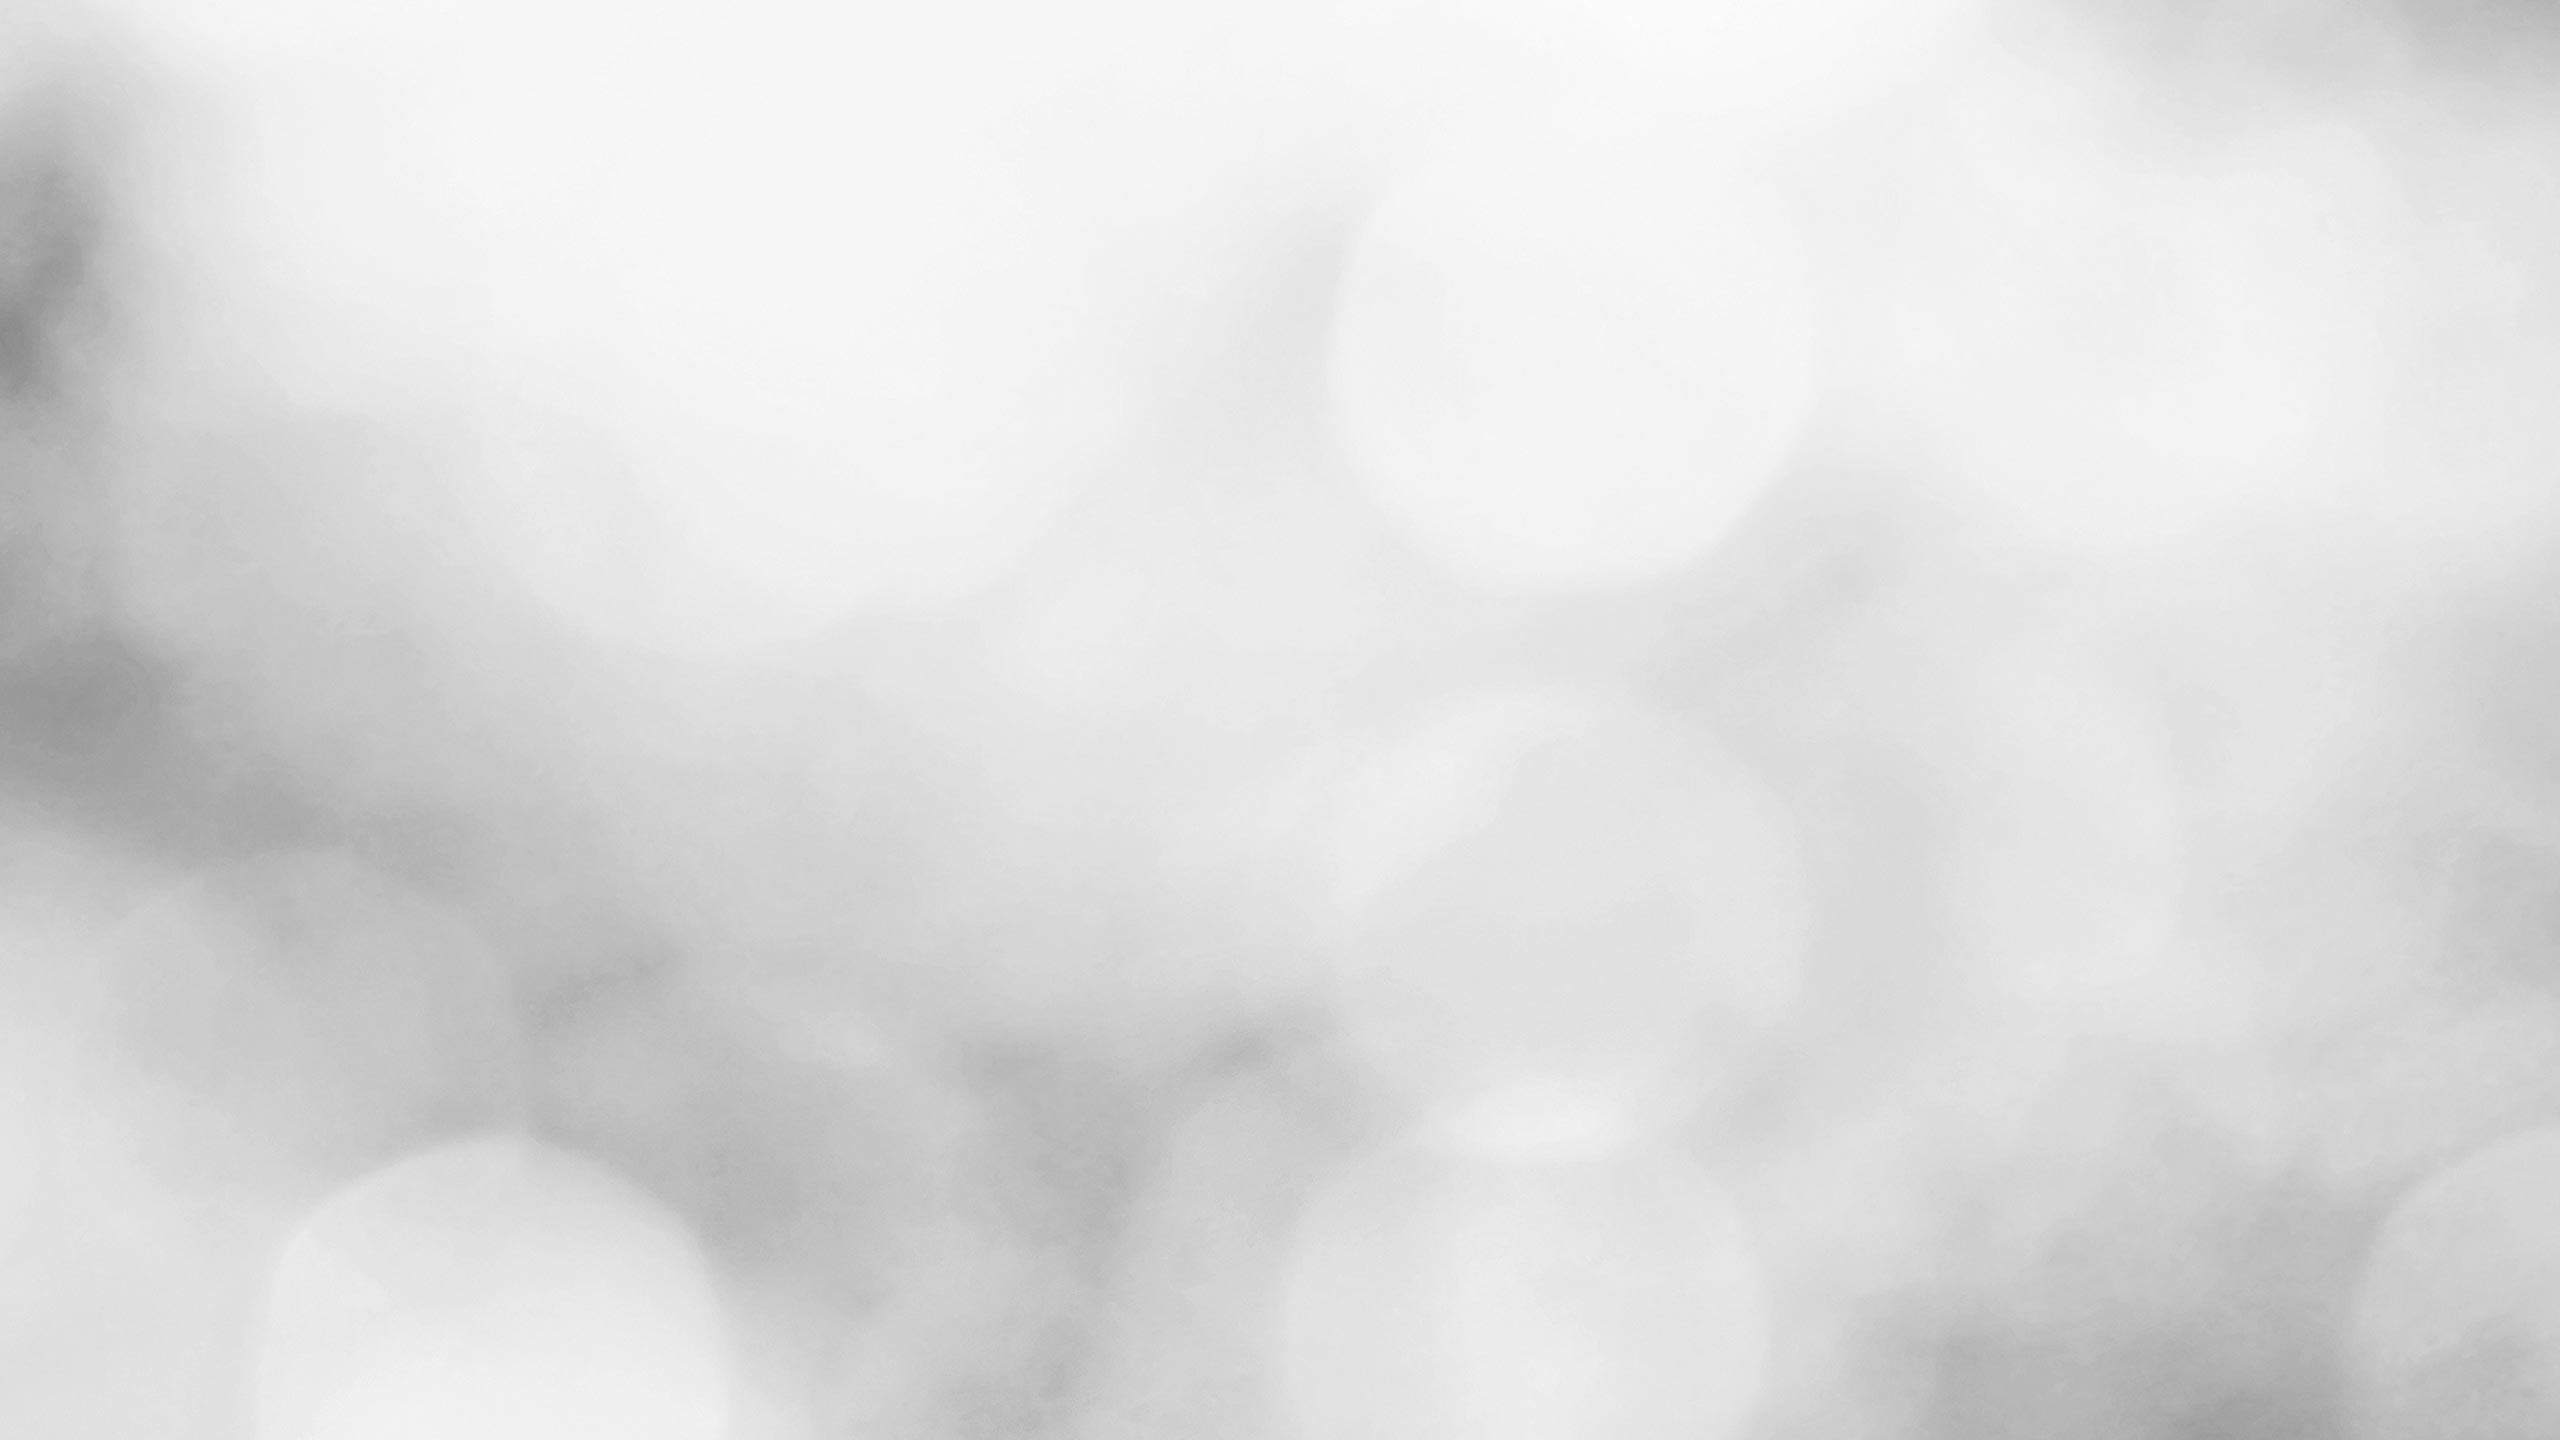 Grey background v1 repricerexpress - Gray background images ...